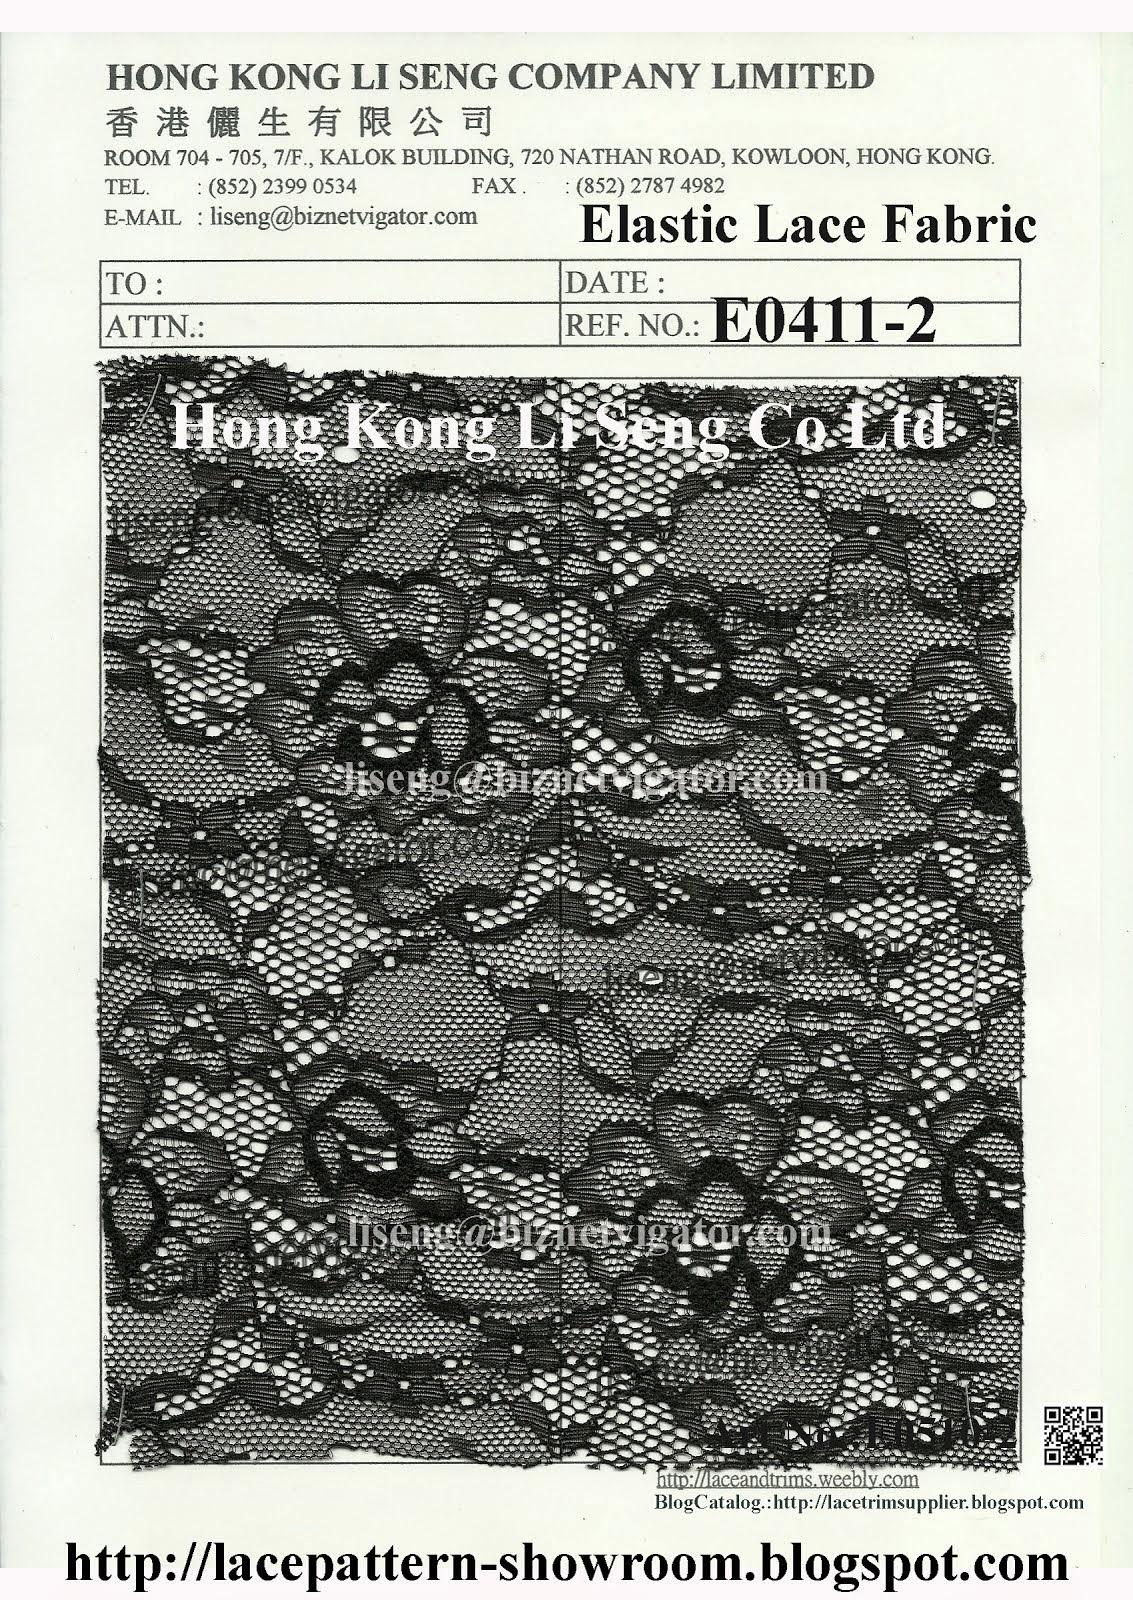 Elastic Lace Fabric Manufacturer Wholesaler and Supplier - Hong Kong Li Seng Co Ltd